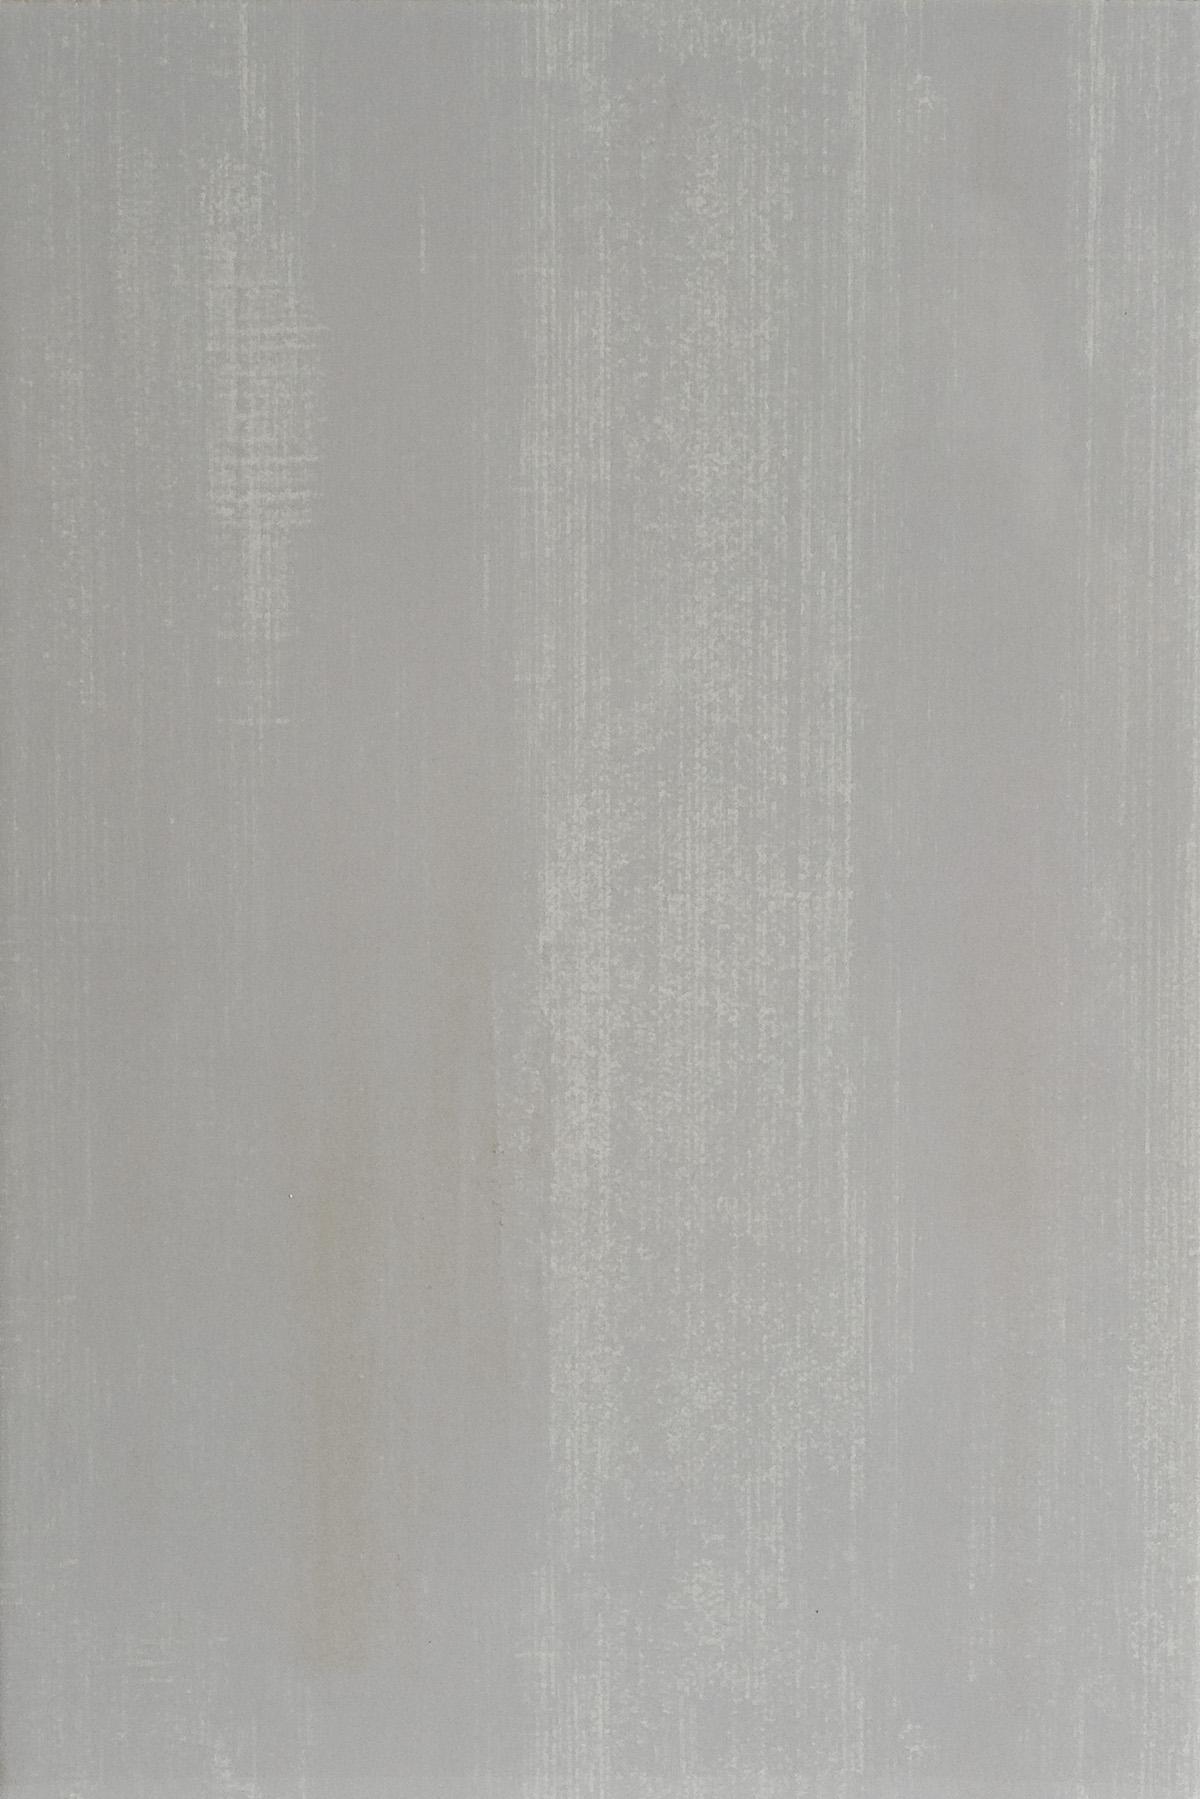 Плитка облицовочная 400х270х8 мм Триора серый (10шт=1,08 кв.м)